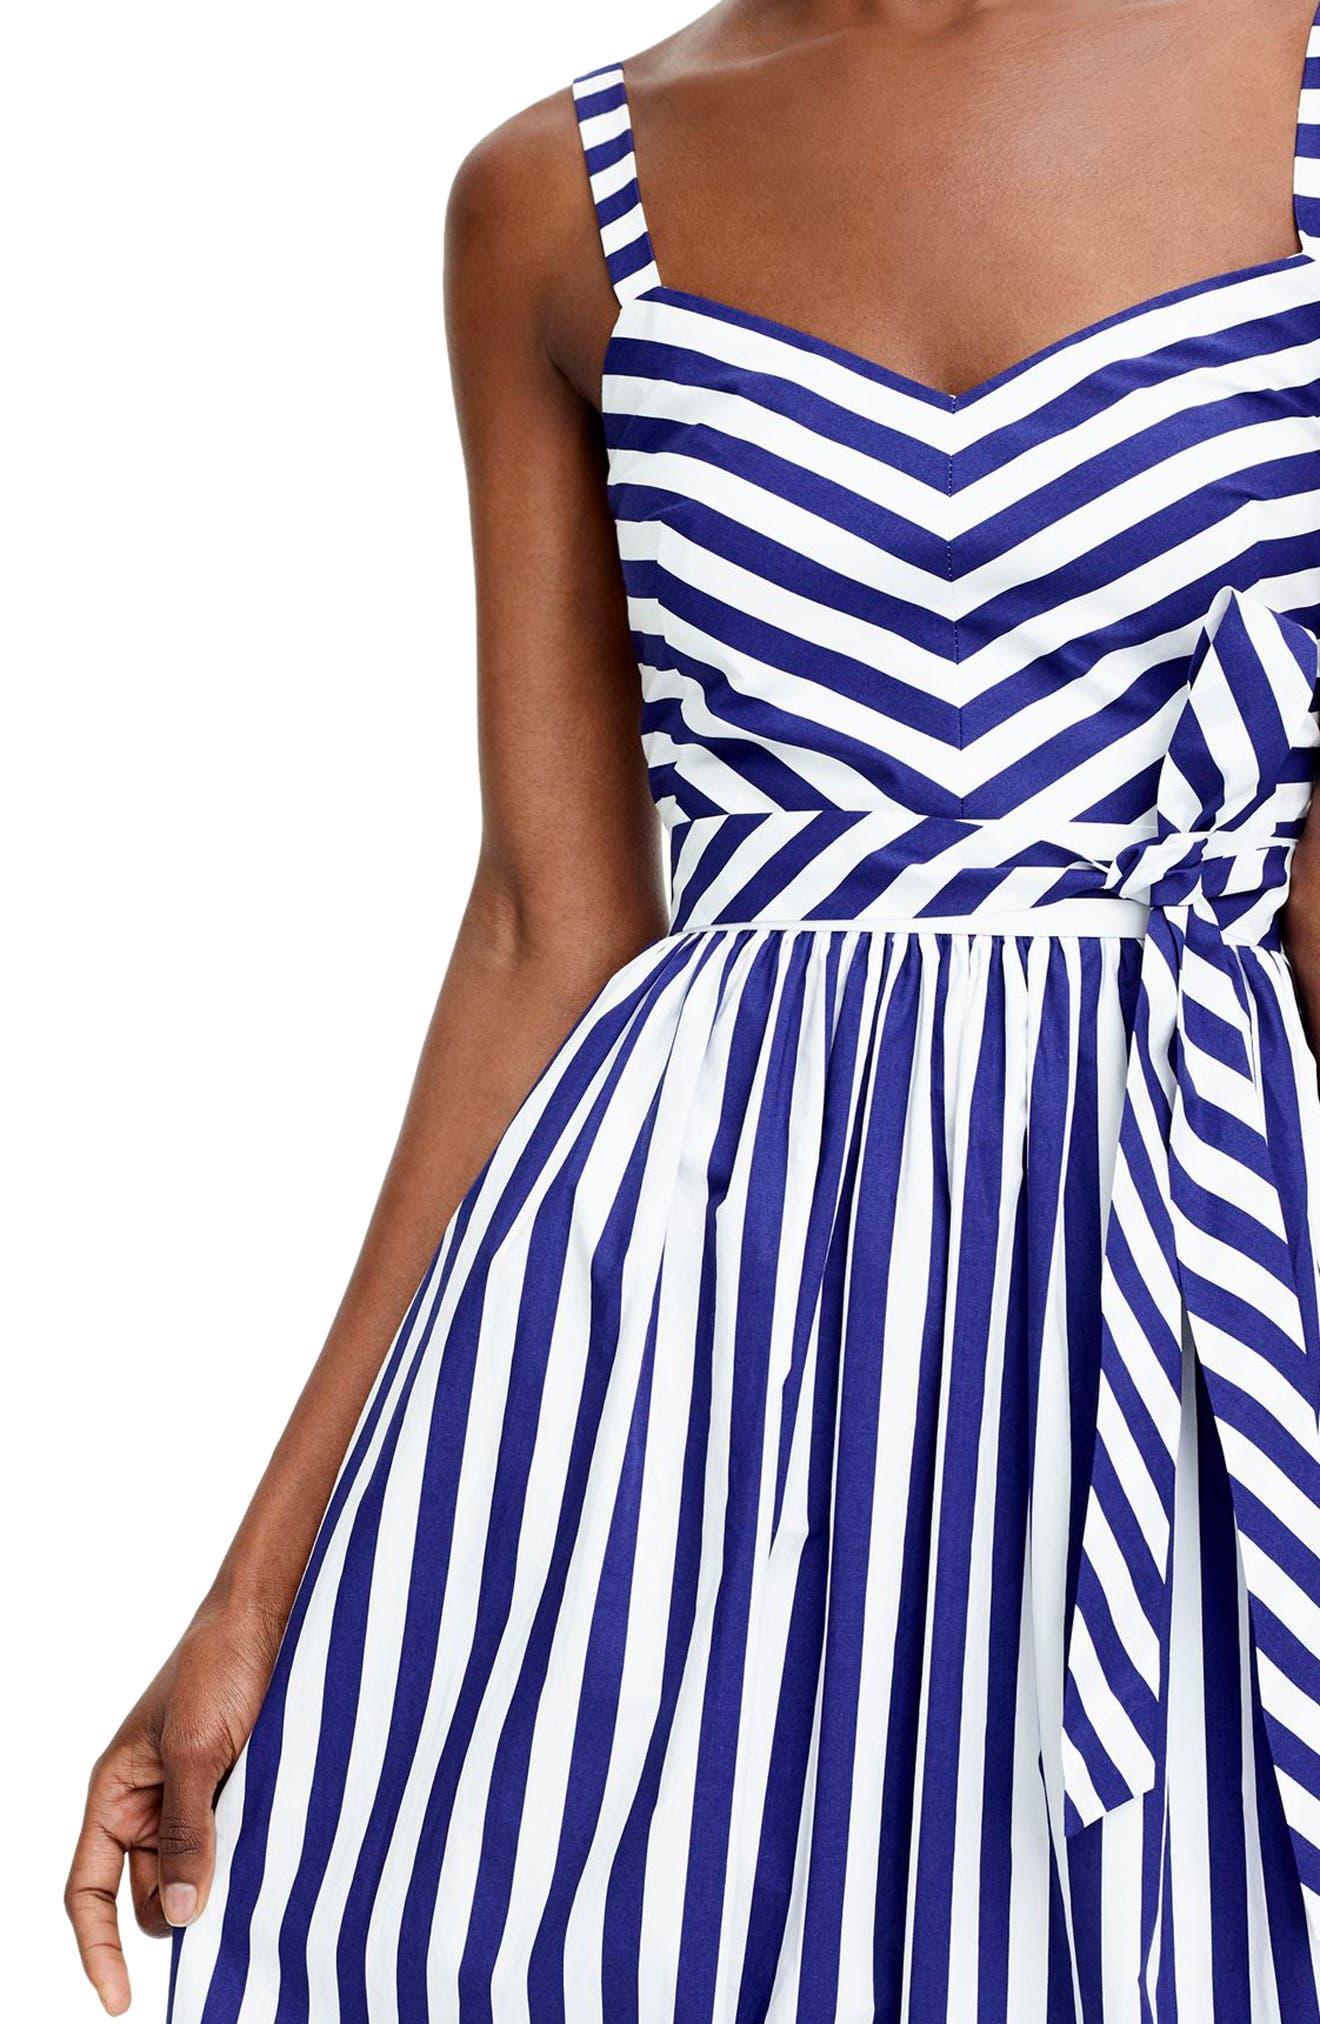 Stripe Ruffle Maxi Dress,                             Alternate thumbnail 3, color,                             400